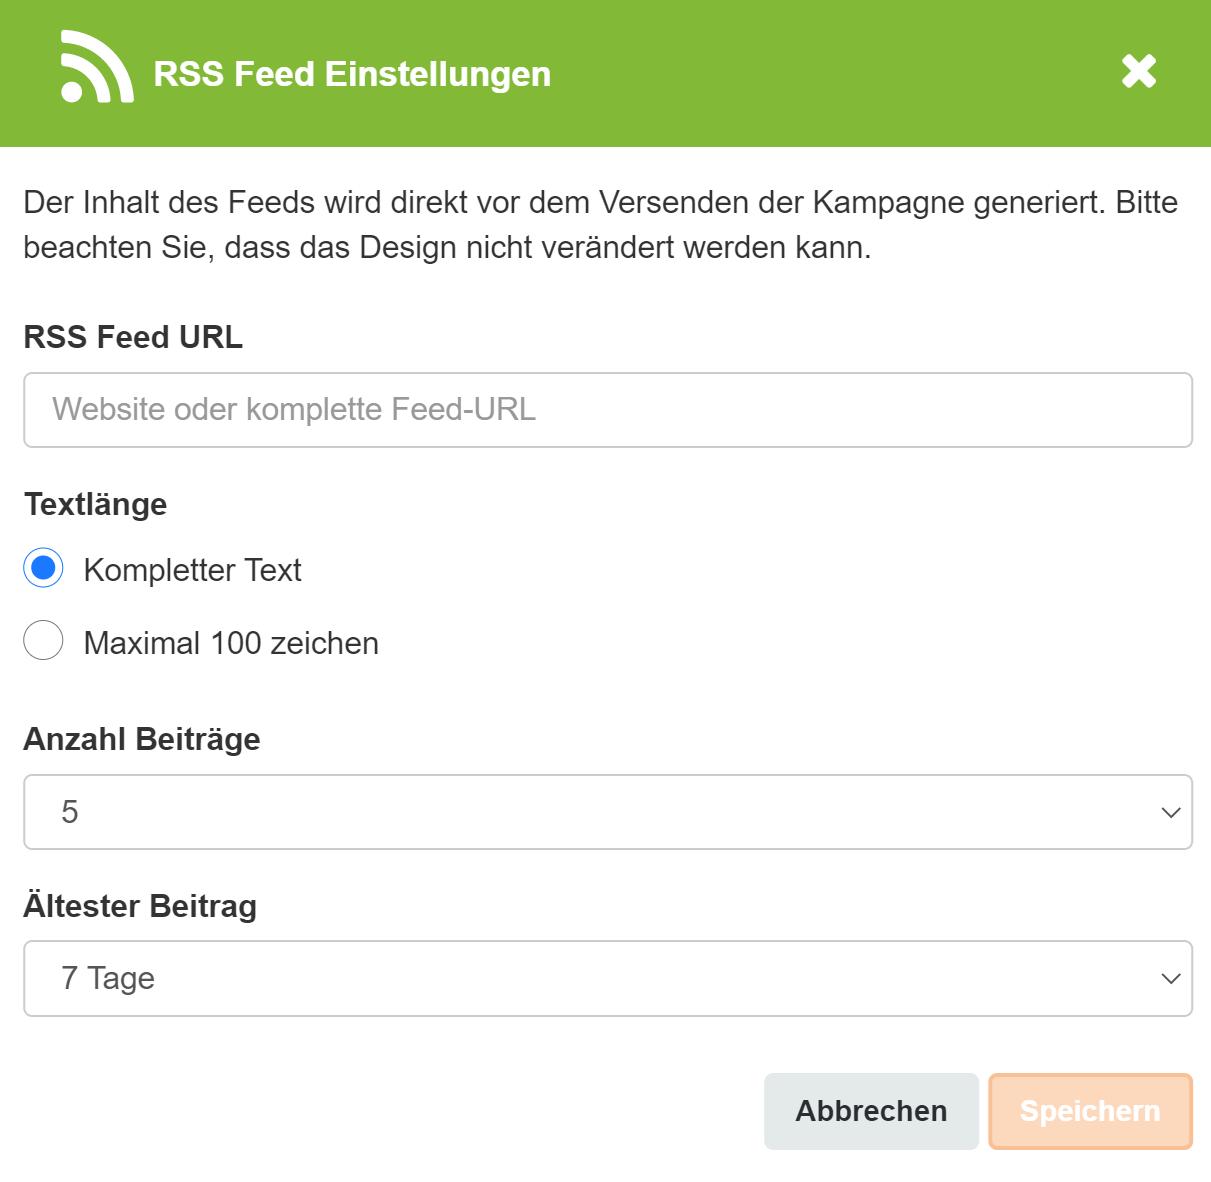 RSS Feed Einstellungen Screenshot